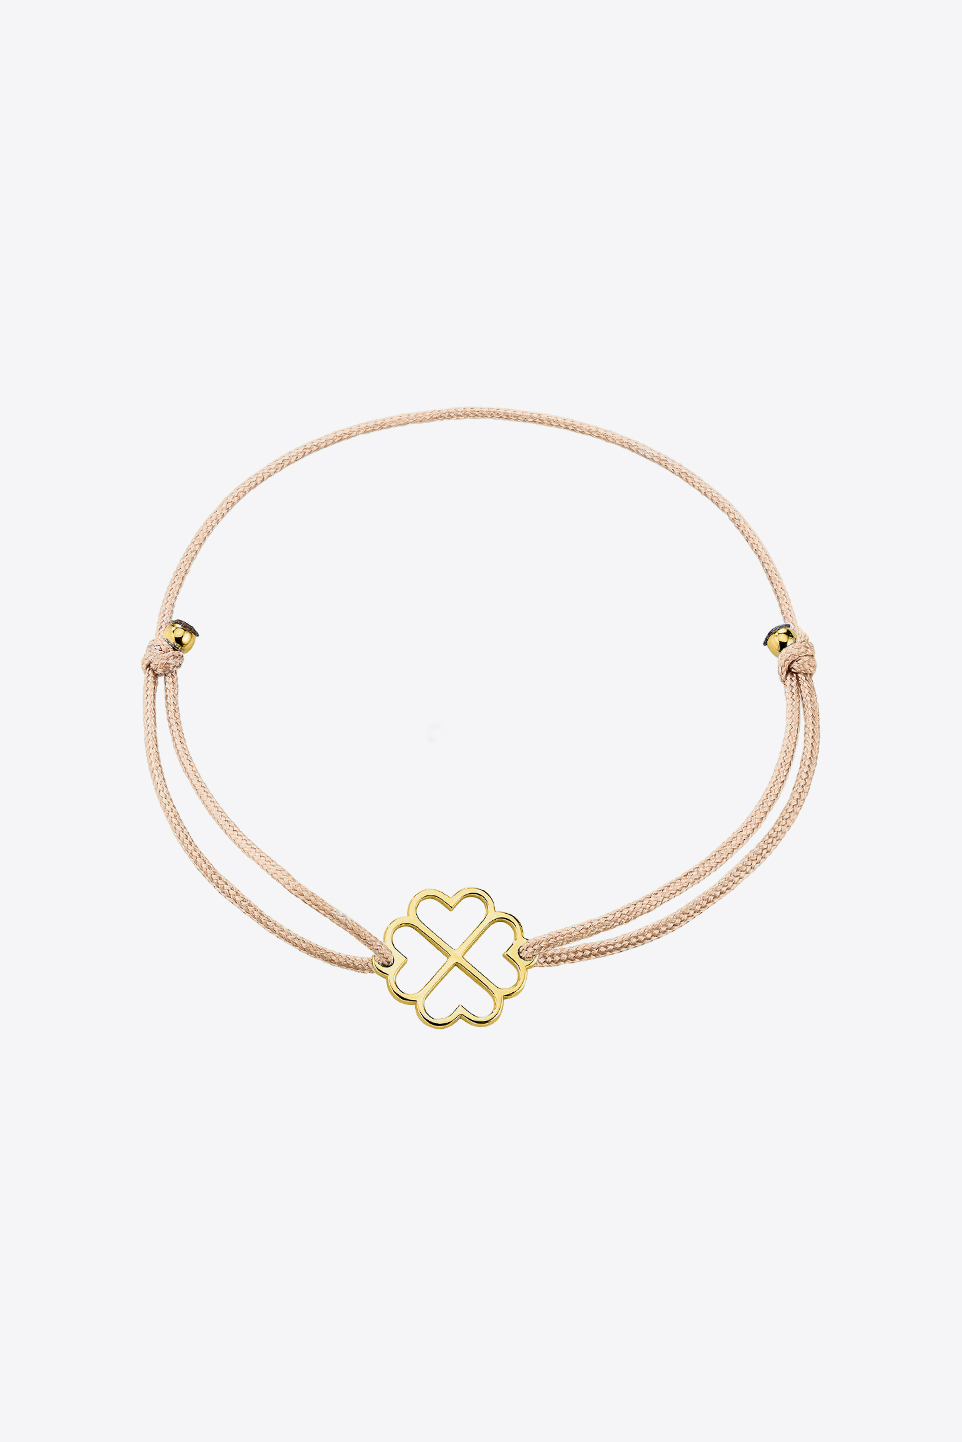 bracelet-lucky21-gold-natural-beige-jasminajovy